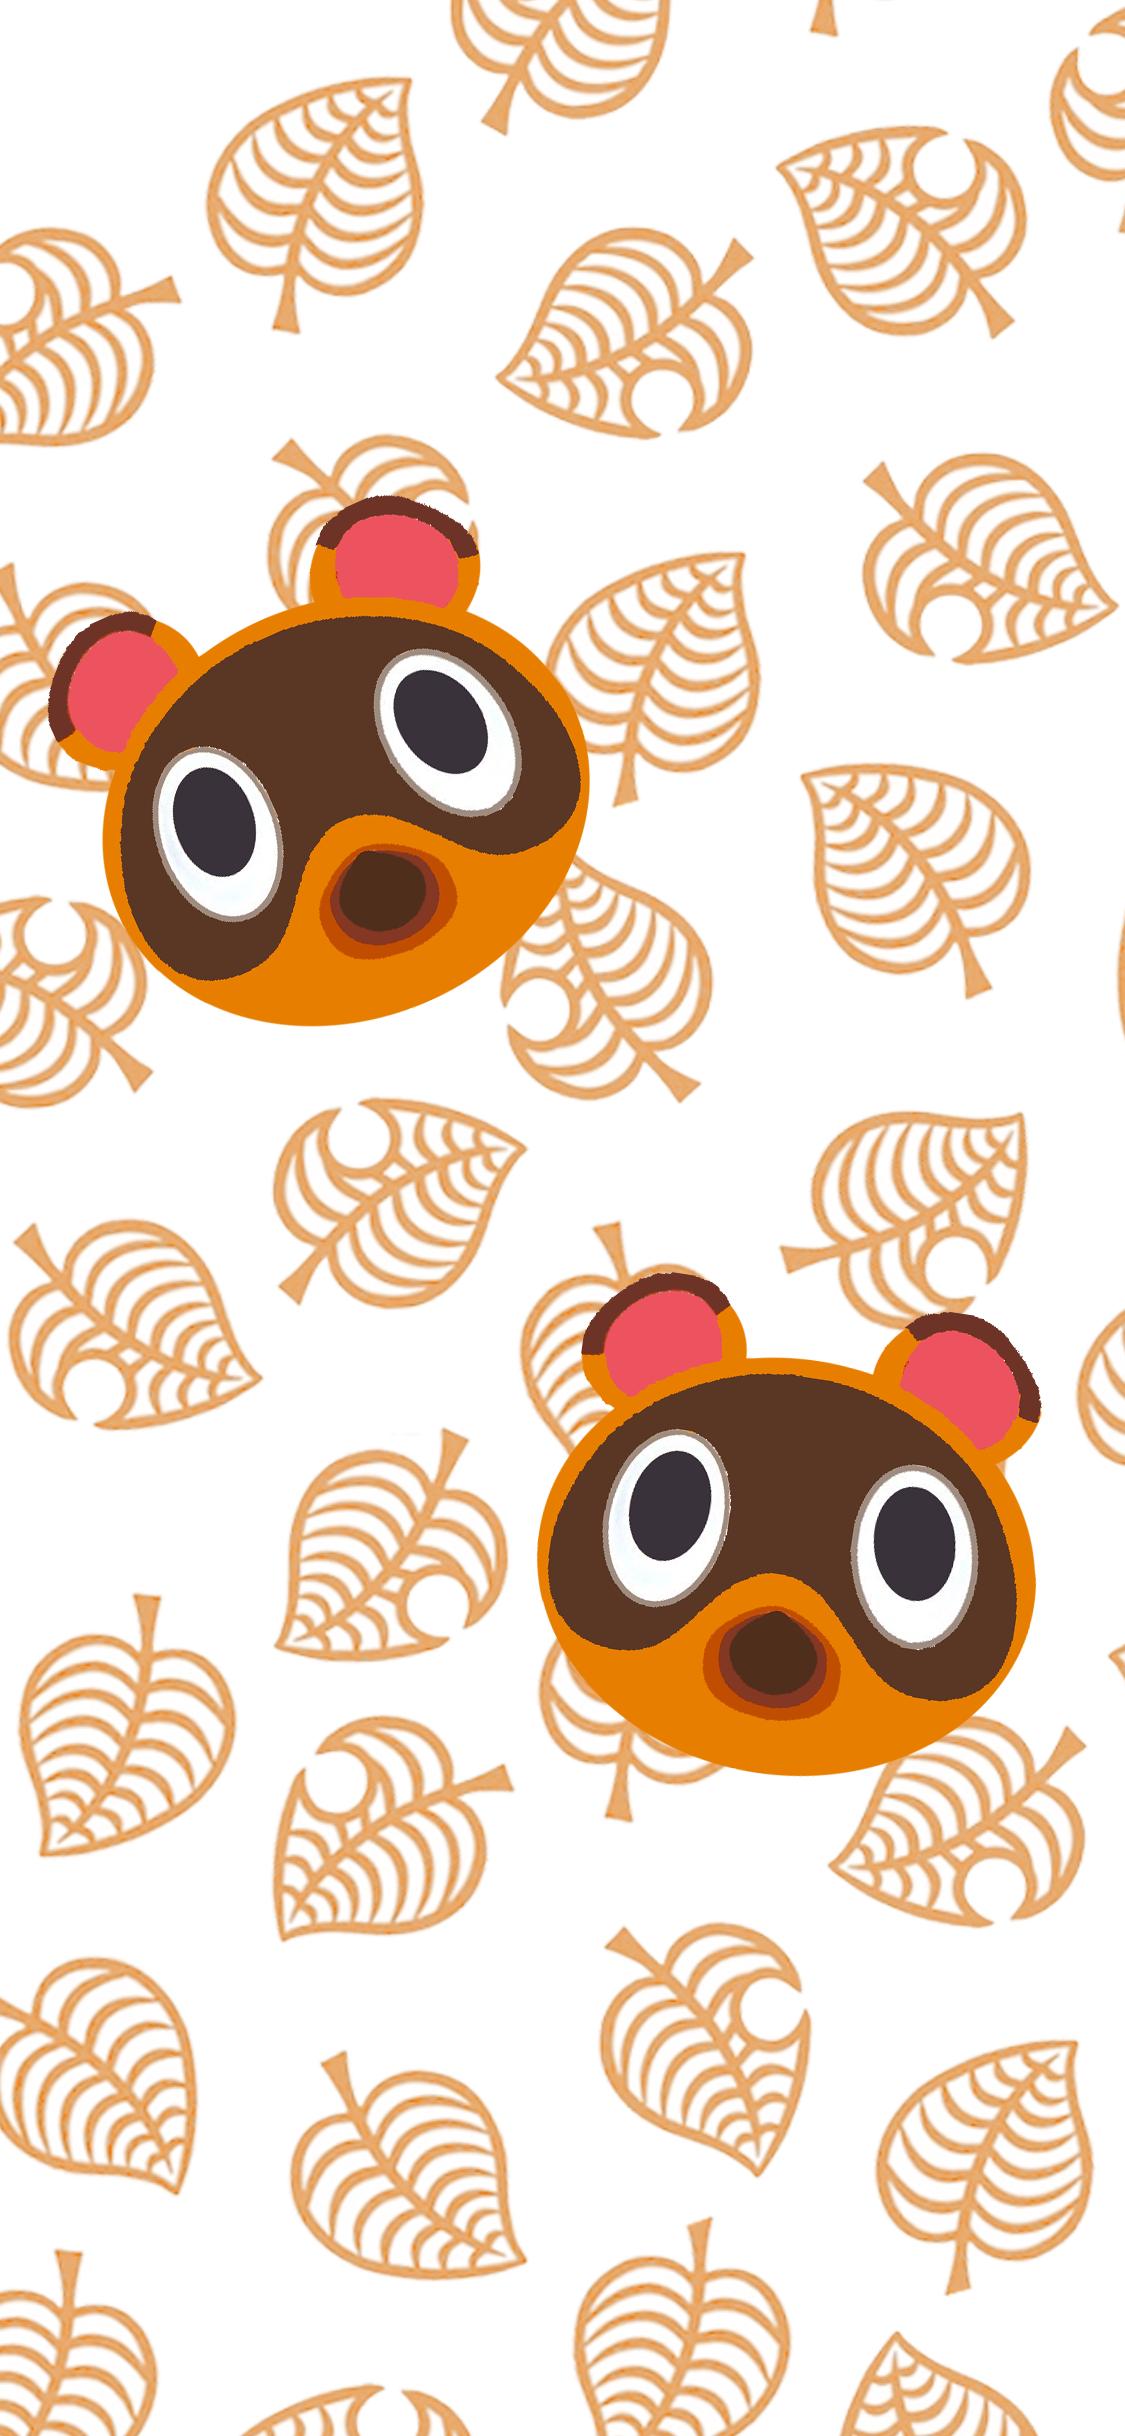 Pin On Screensaver Animal Crossing Animal Crossing Fan Art Animal Crossing Leaf